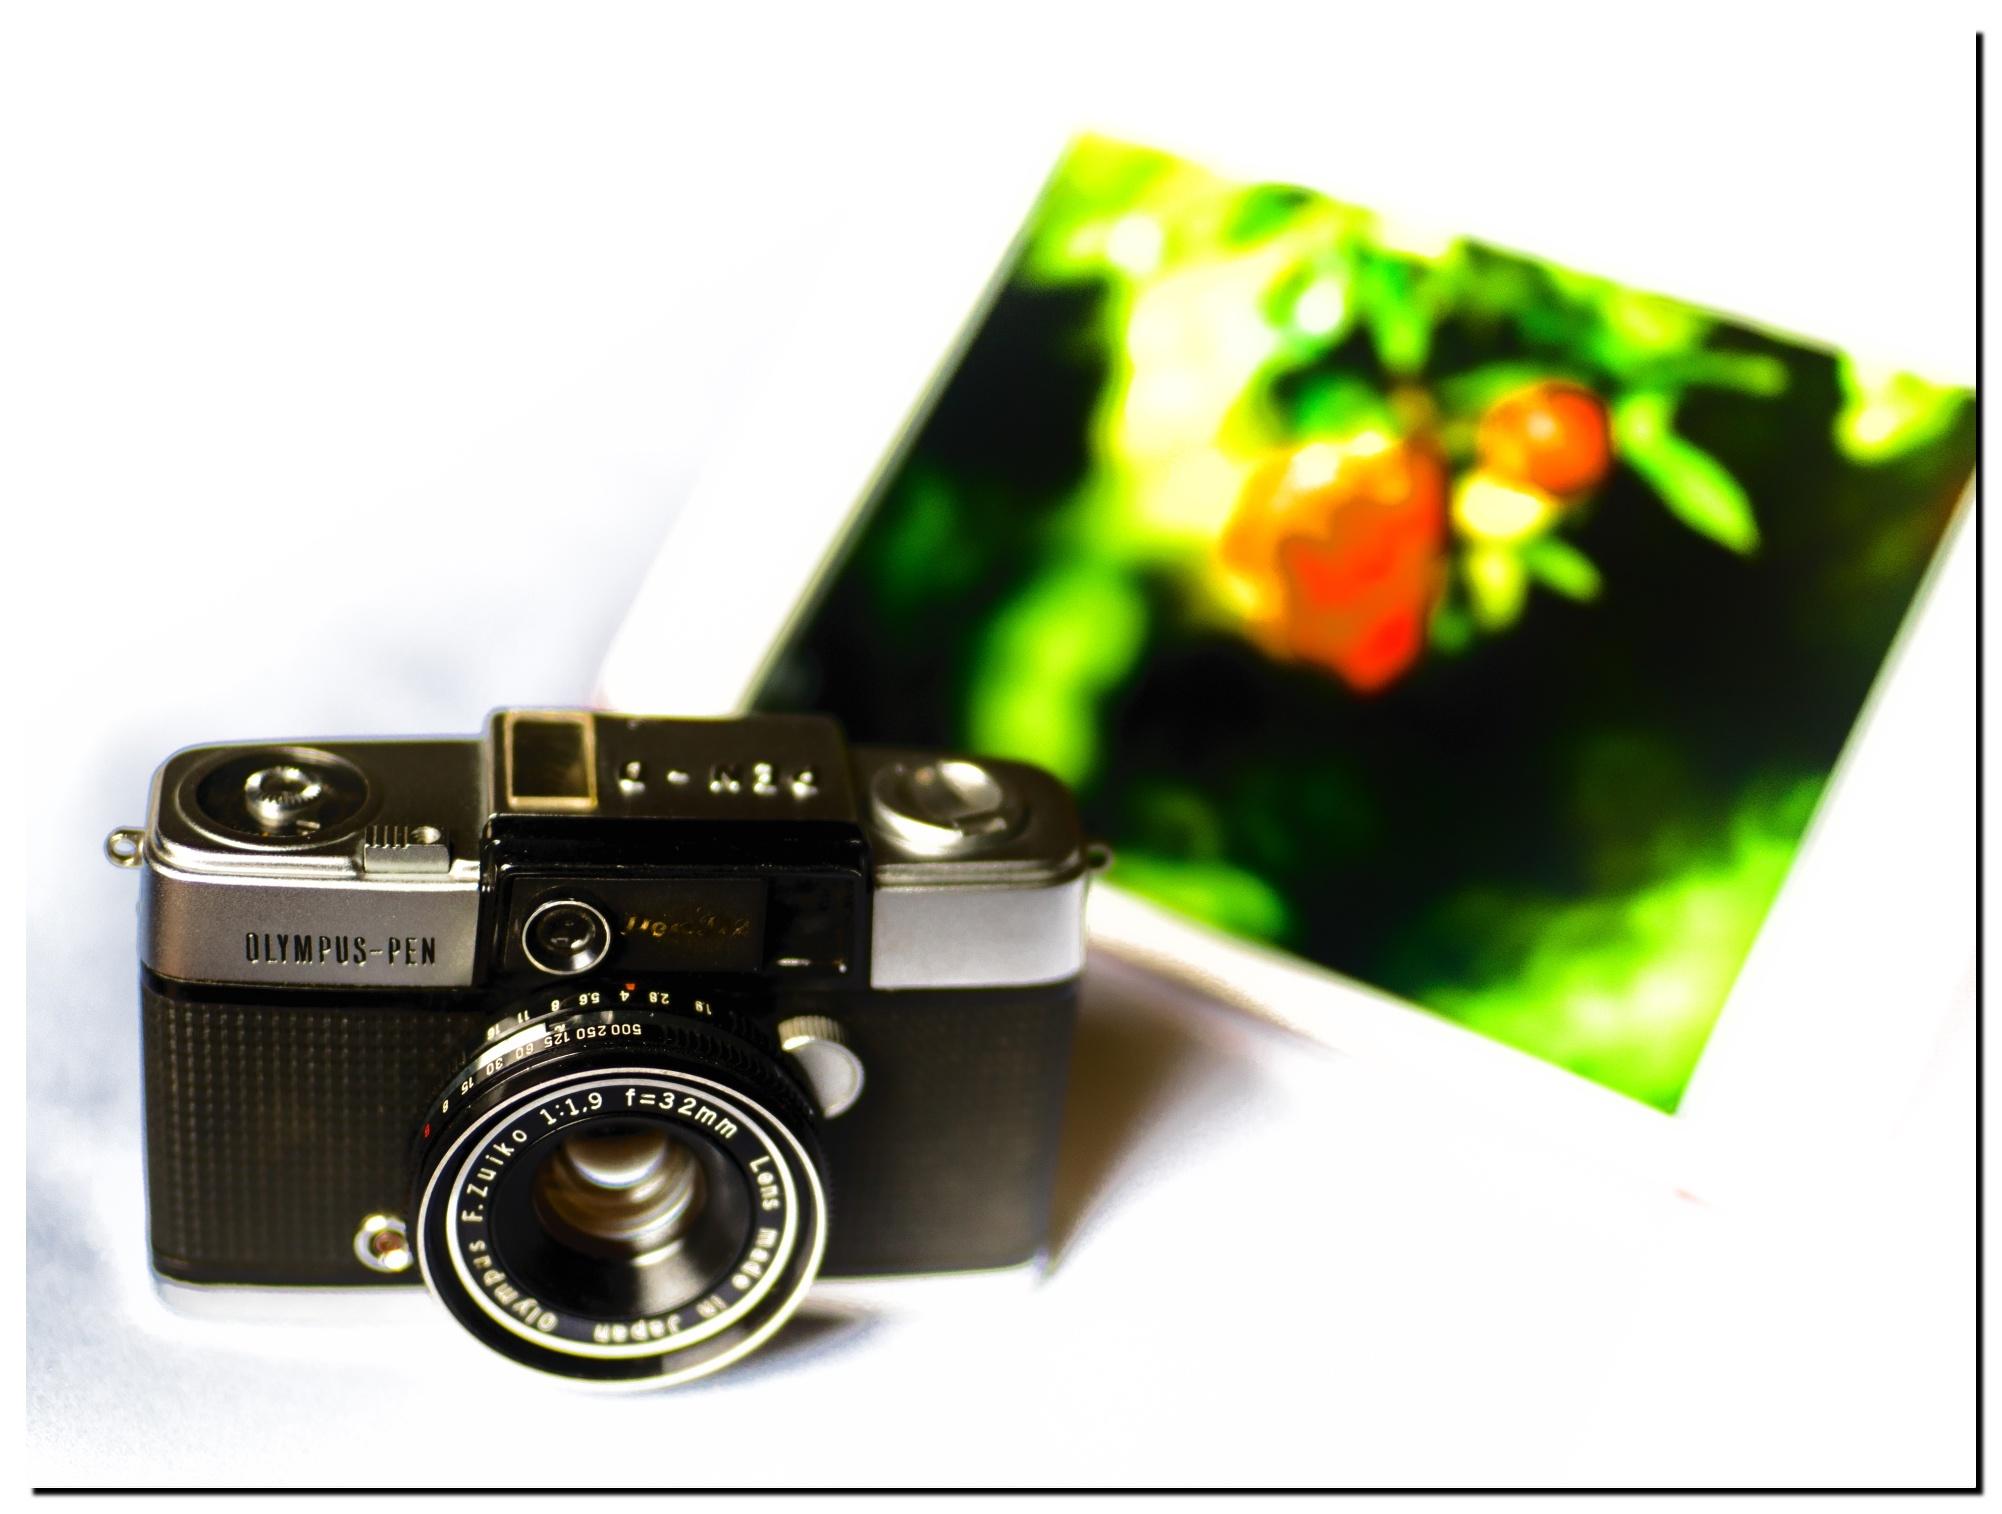 01LR-P7180285-Edit-3.jpg